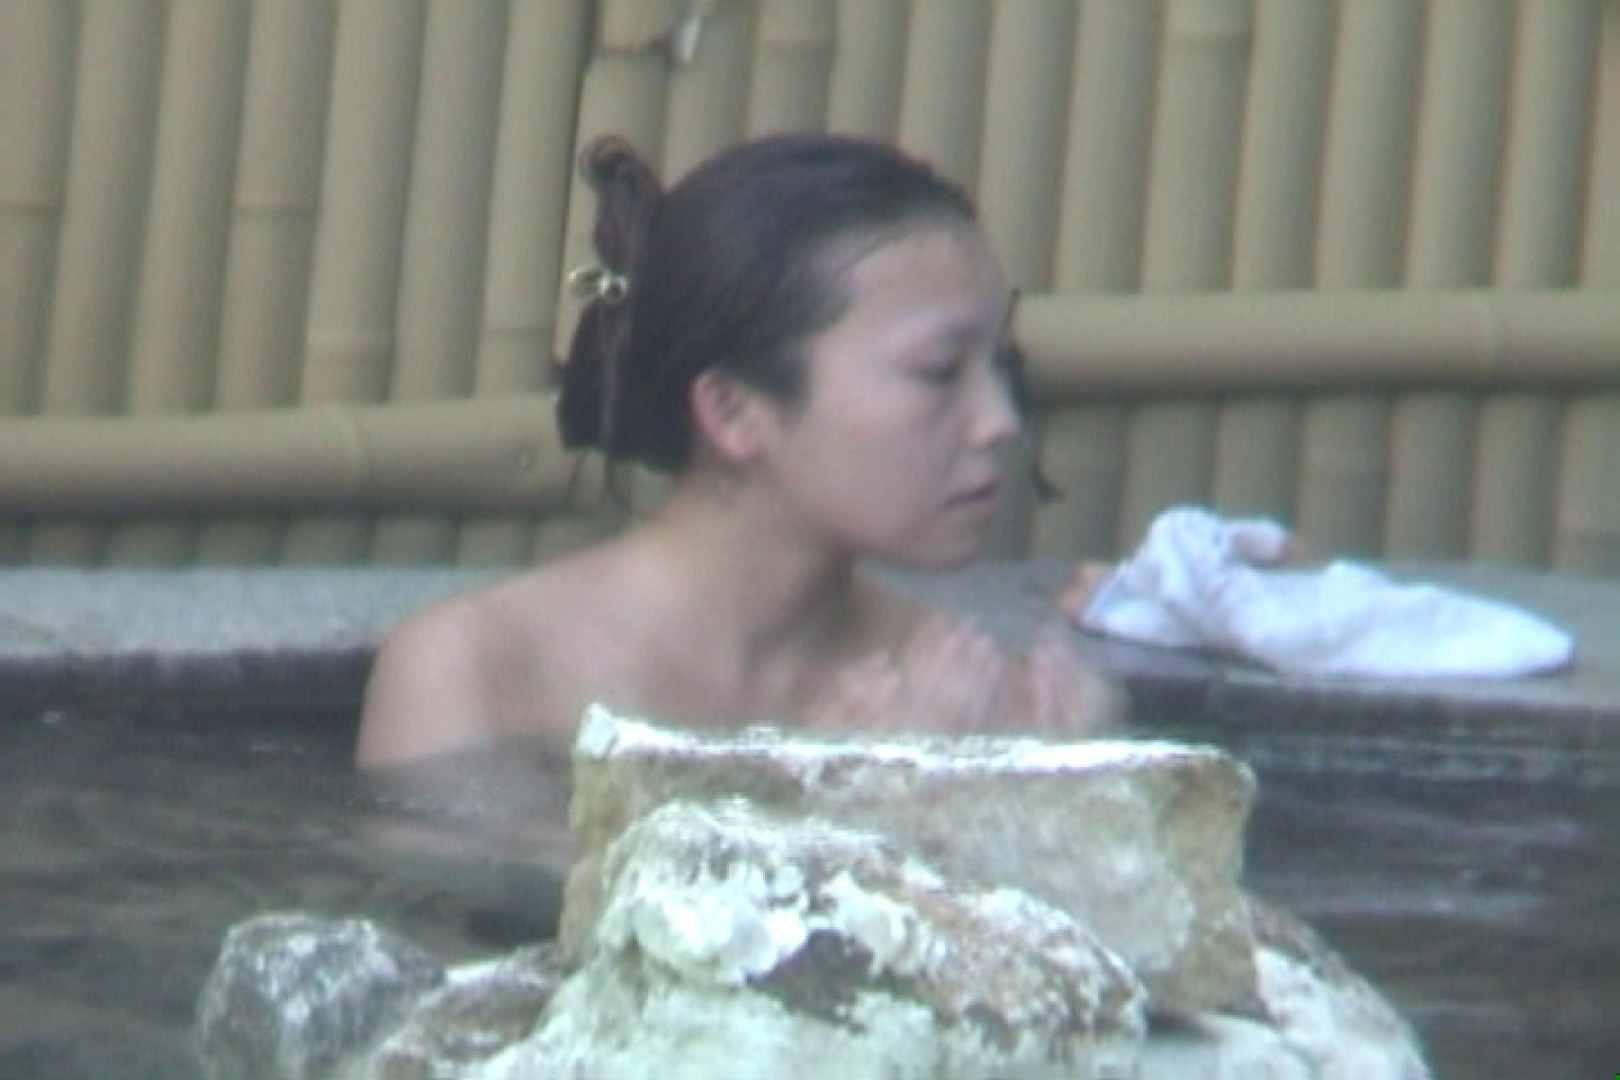 Aquaな露天風呂Vol.572 OLのエロ生活 | 露天風呂  52連発 49